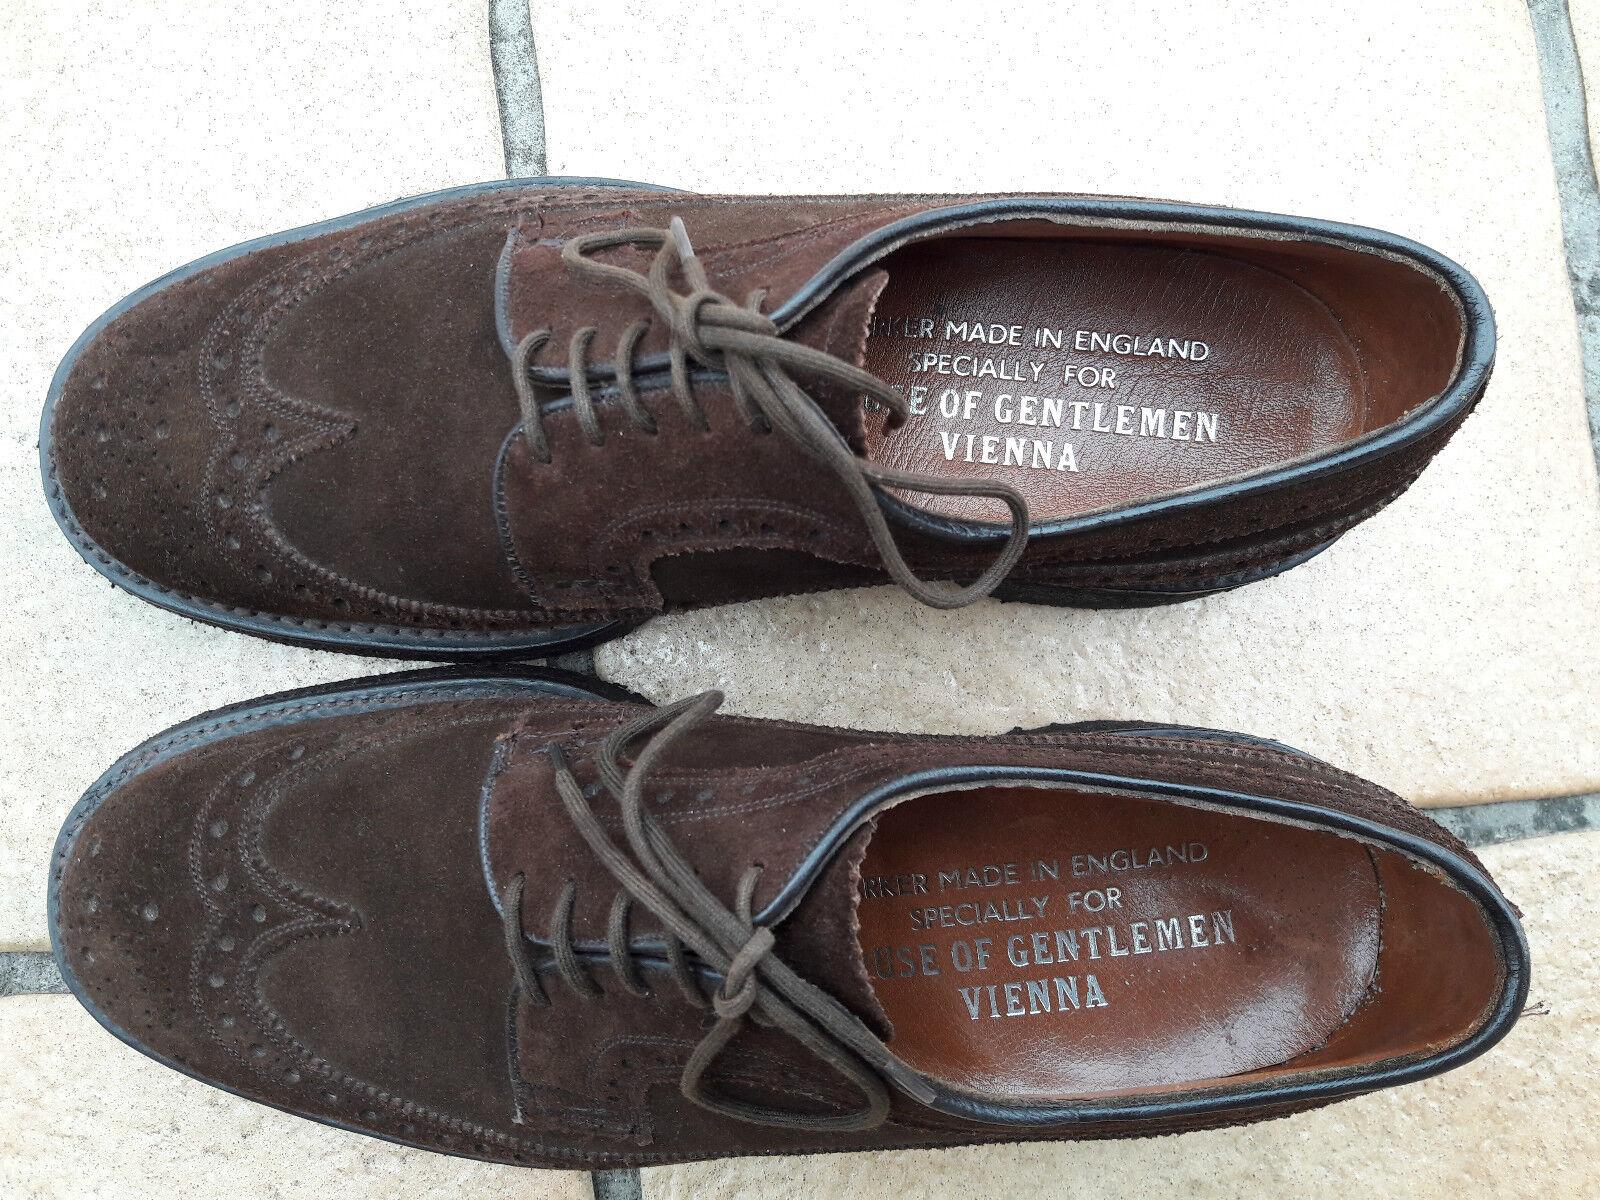 Barker Barker Barker for House of Gentlemen in Vienna, suede brogues derbies 6.5UK 0fa436